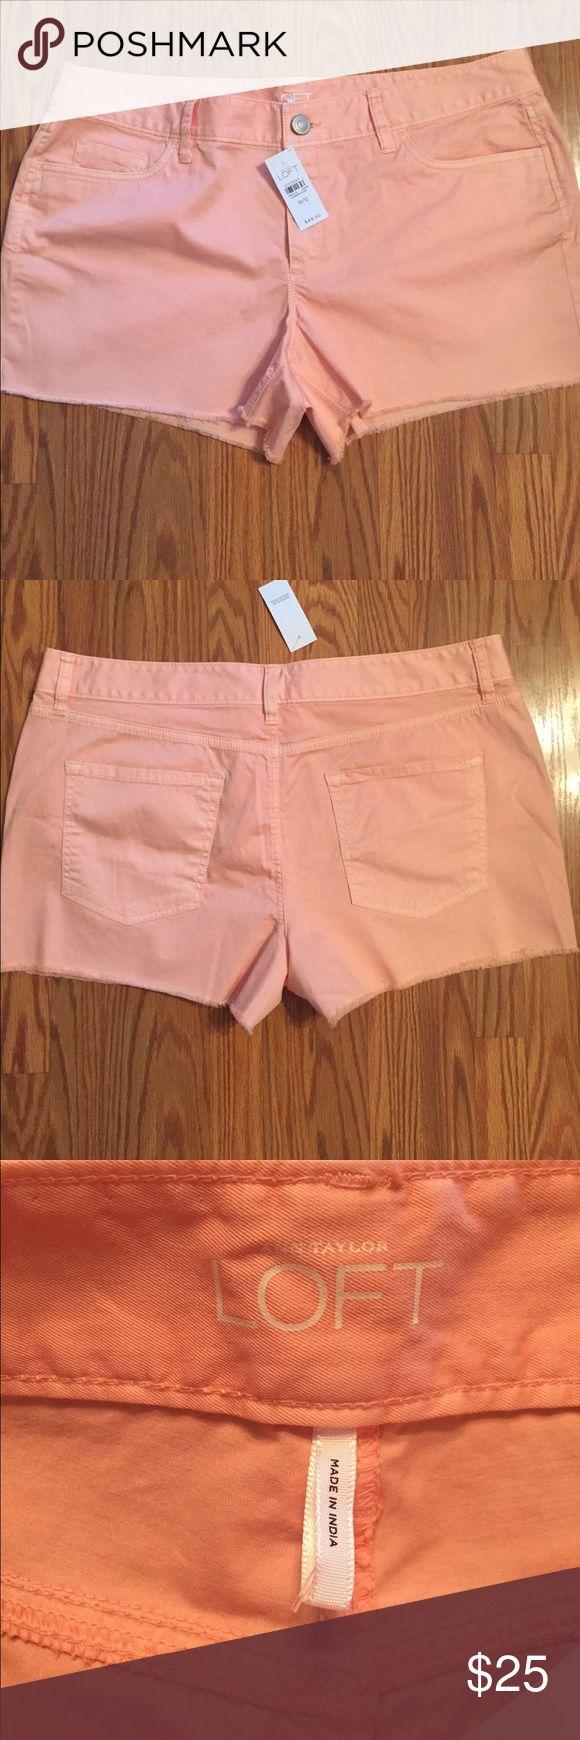 "Ann Taylor loft shorts Ann Taylor loft peach shorts, inseam 3"" Ann Taylor Shorts"